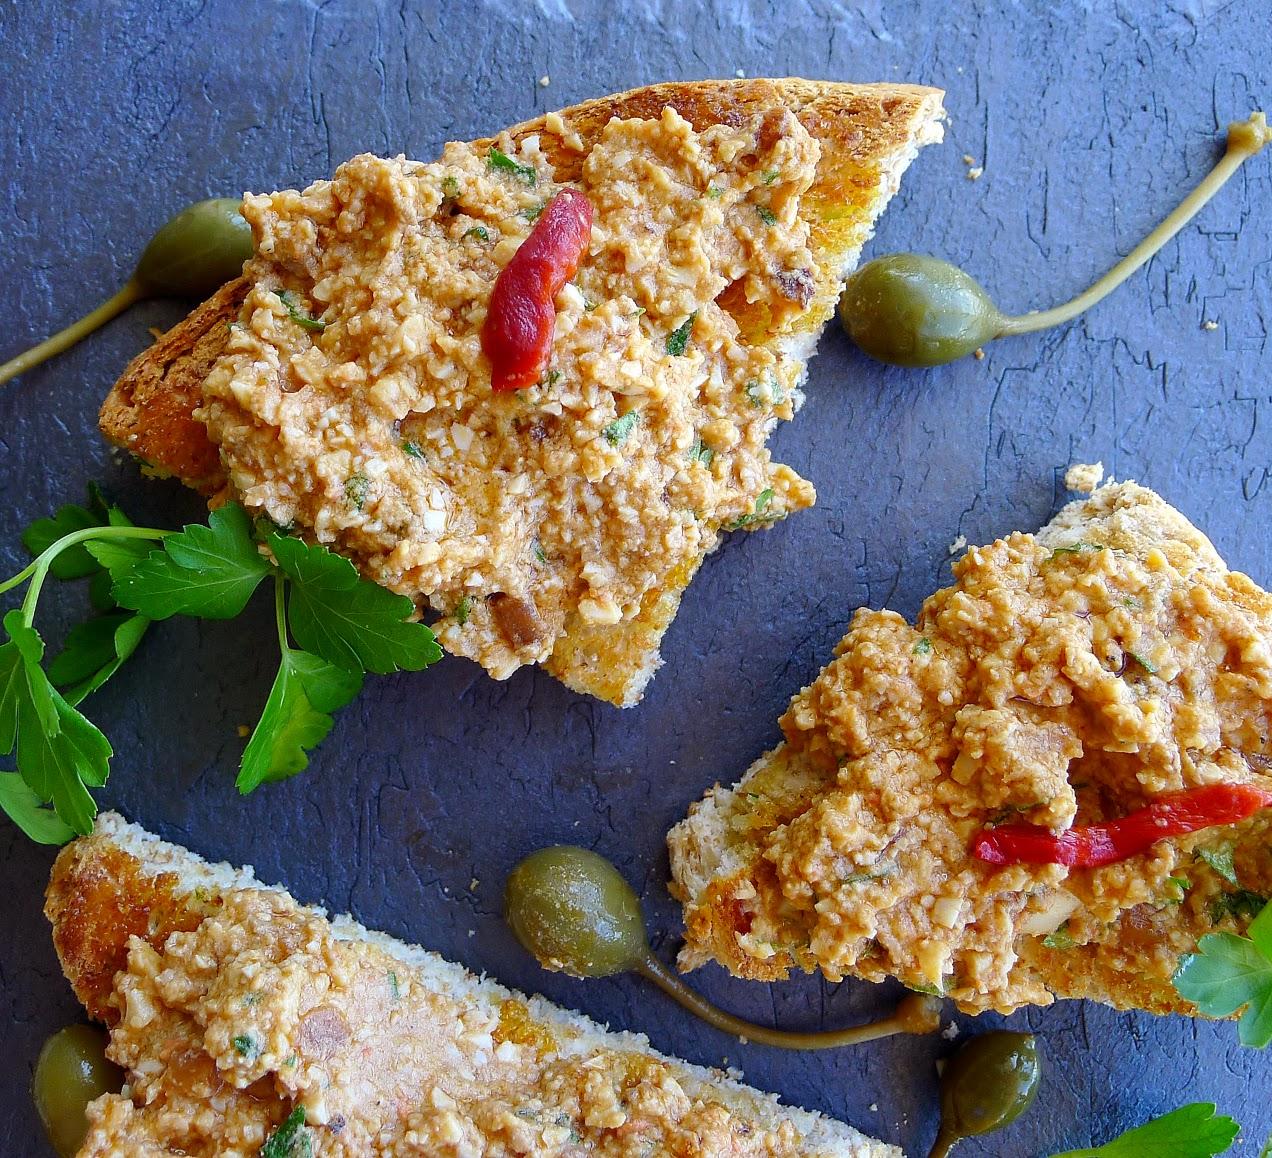 Monkfish liver pâté on toasts.